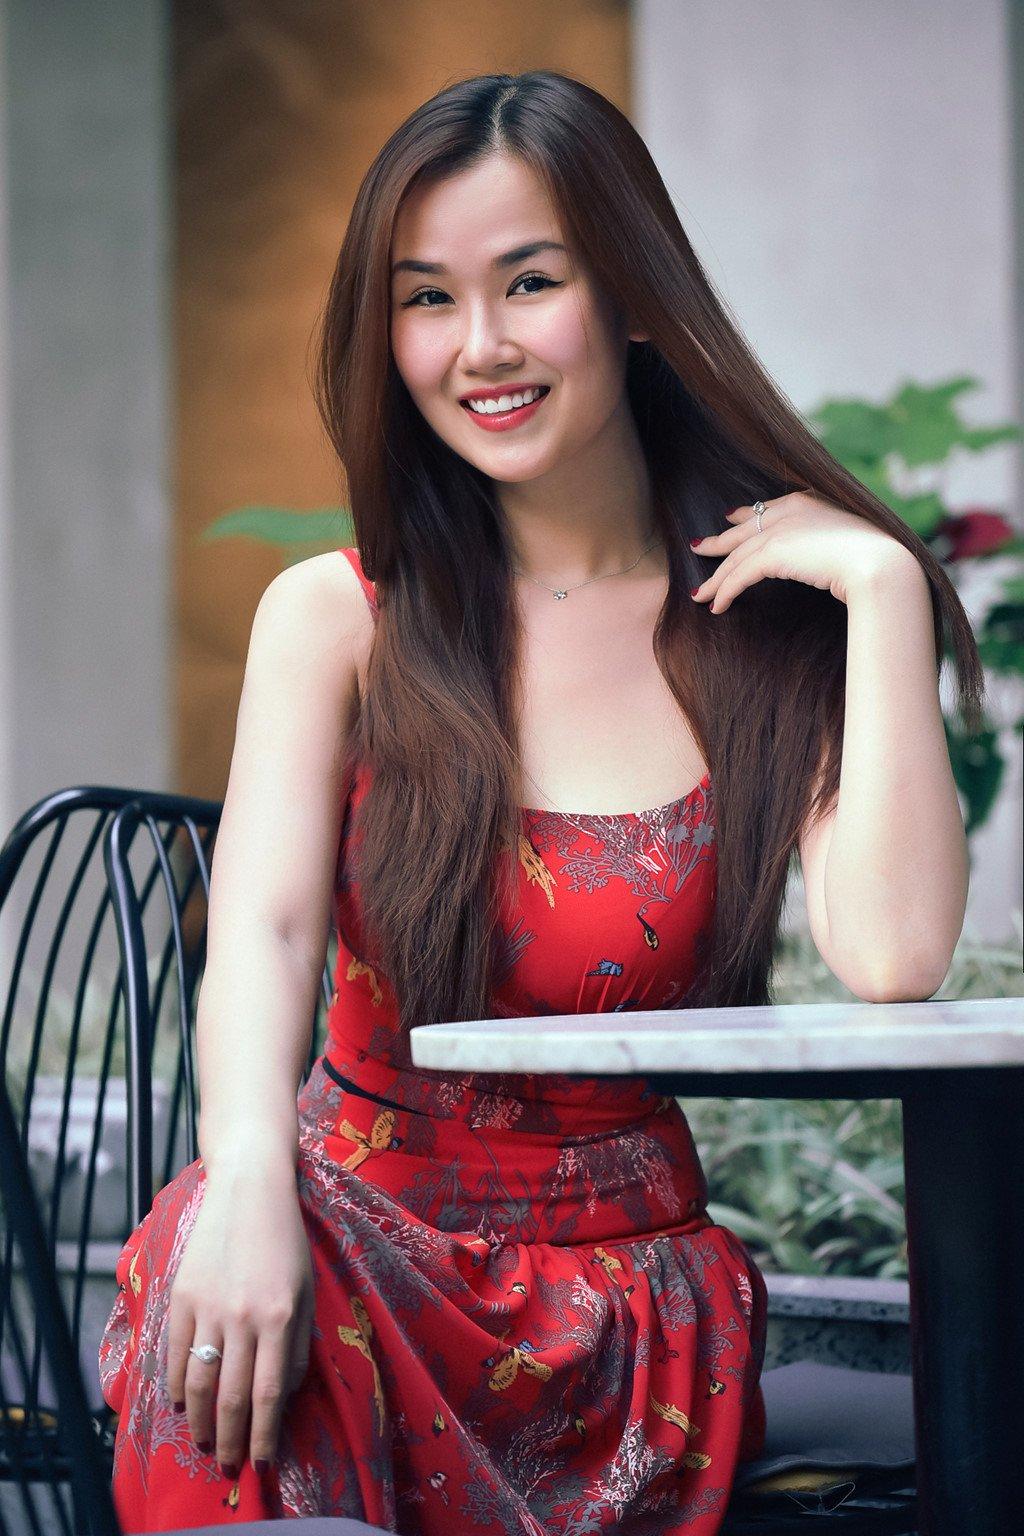 Ha Tram: 'Suy sup vi ban trai phan boi, suyt bi bau show cuong hiep' hinh anh 2